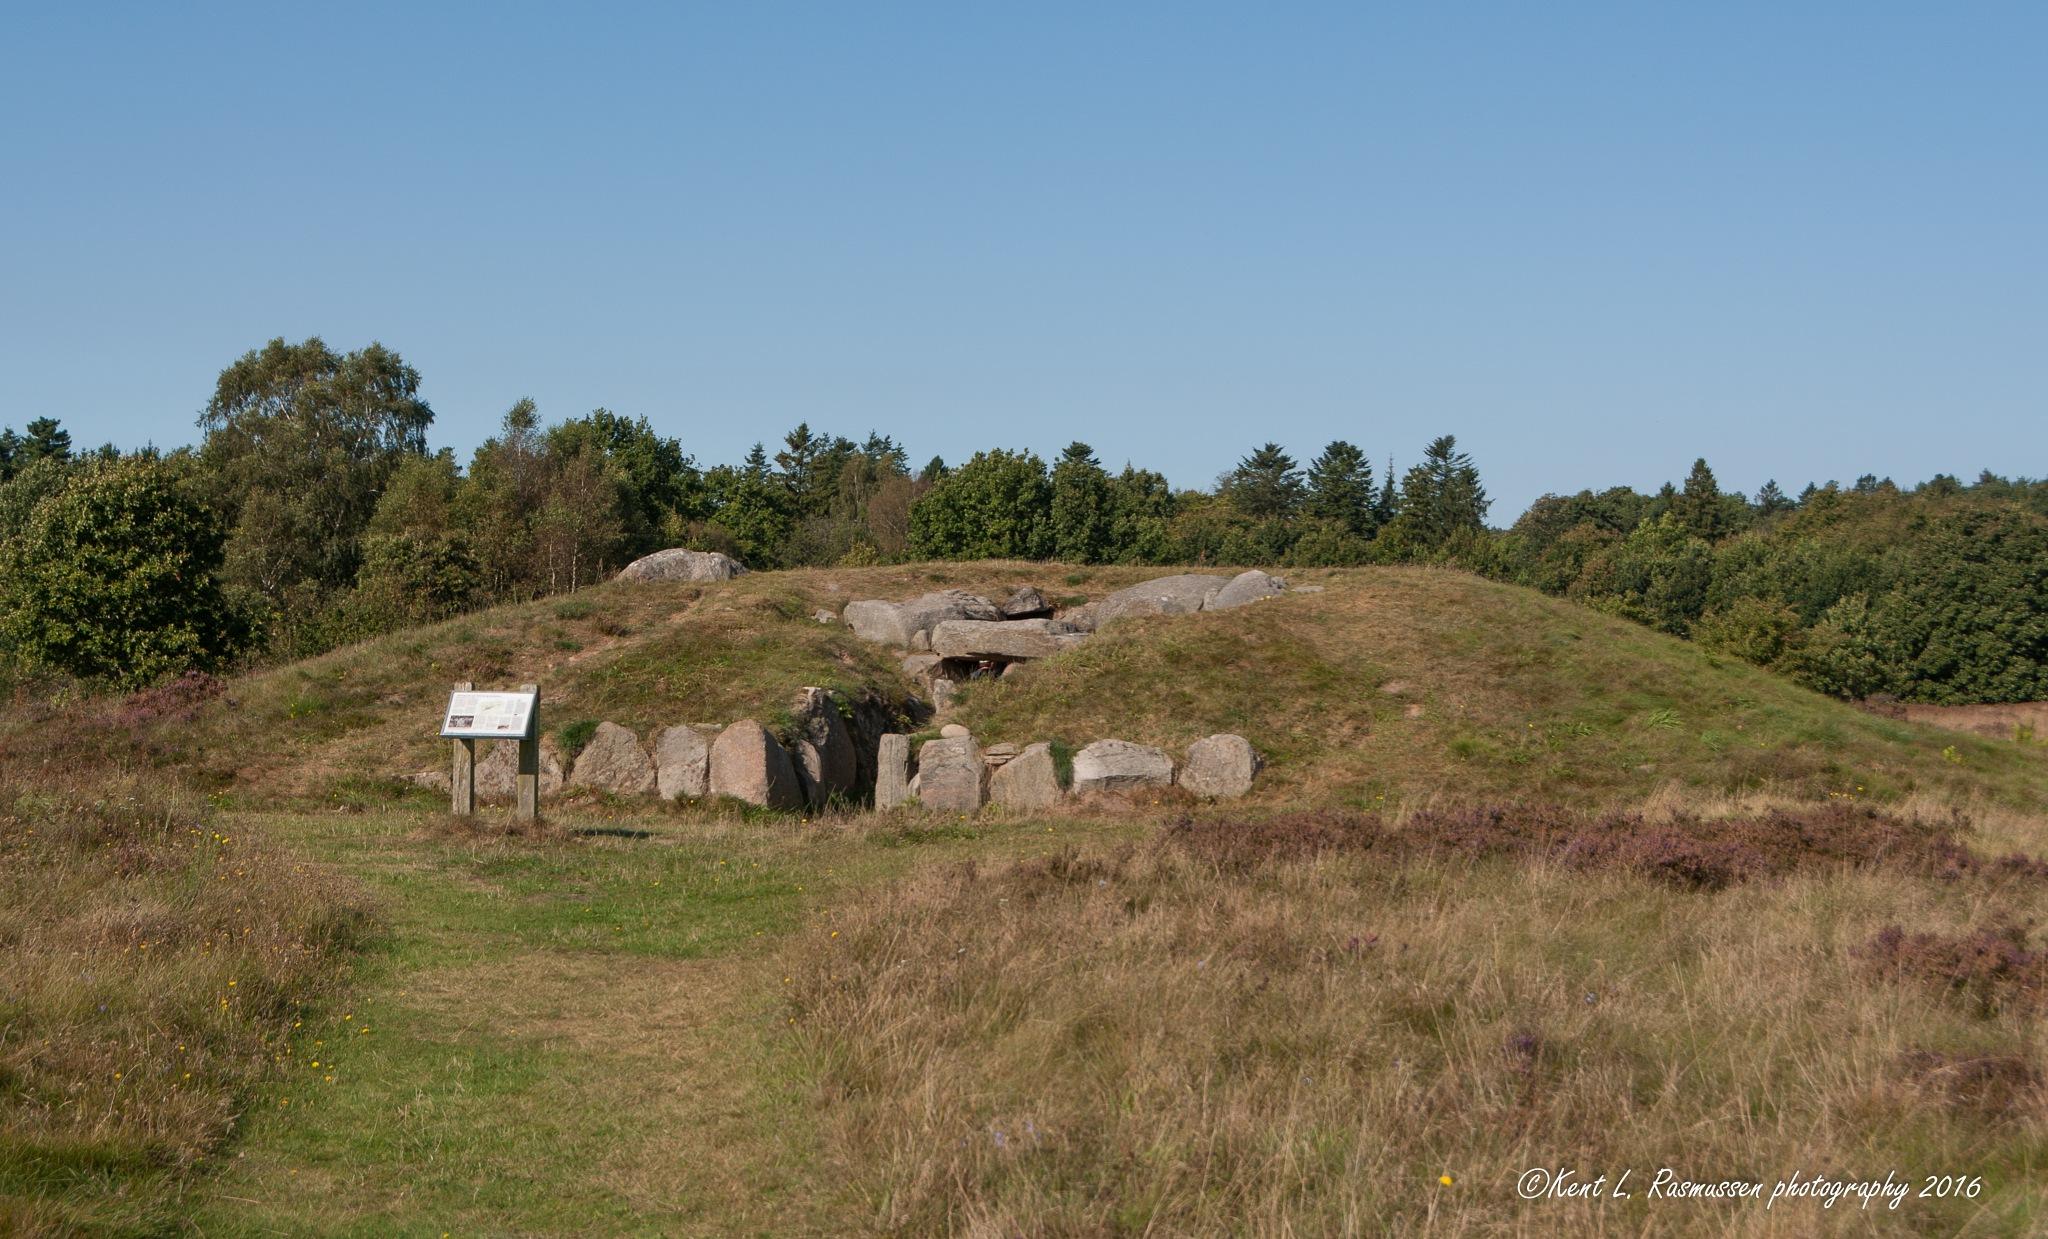 Jættestuen at Tustrup burial ground  by Kent L. Rasmussen